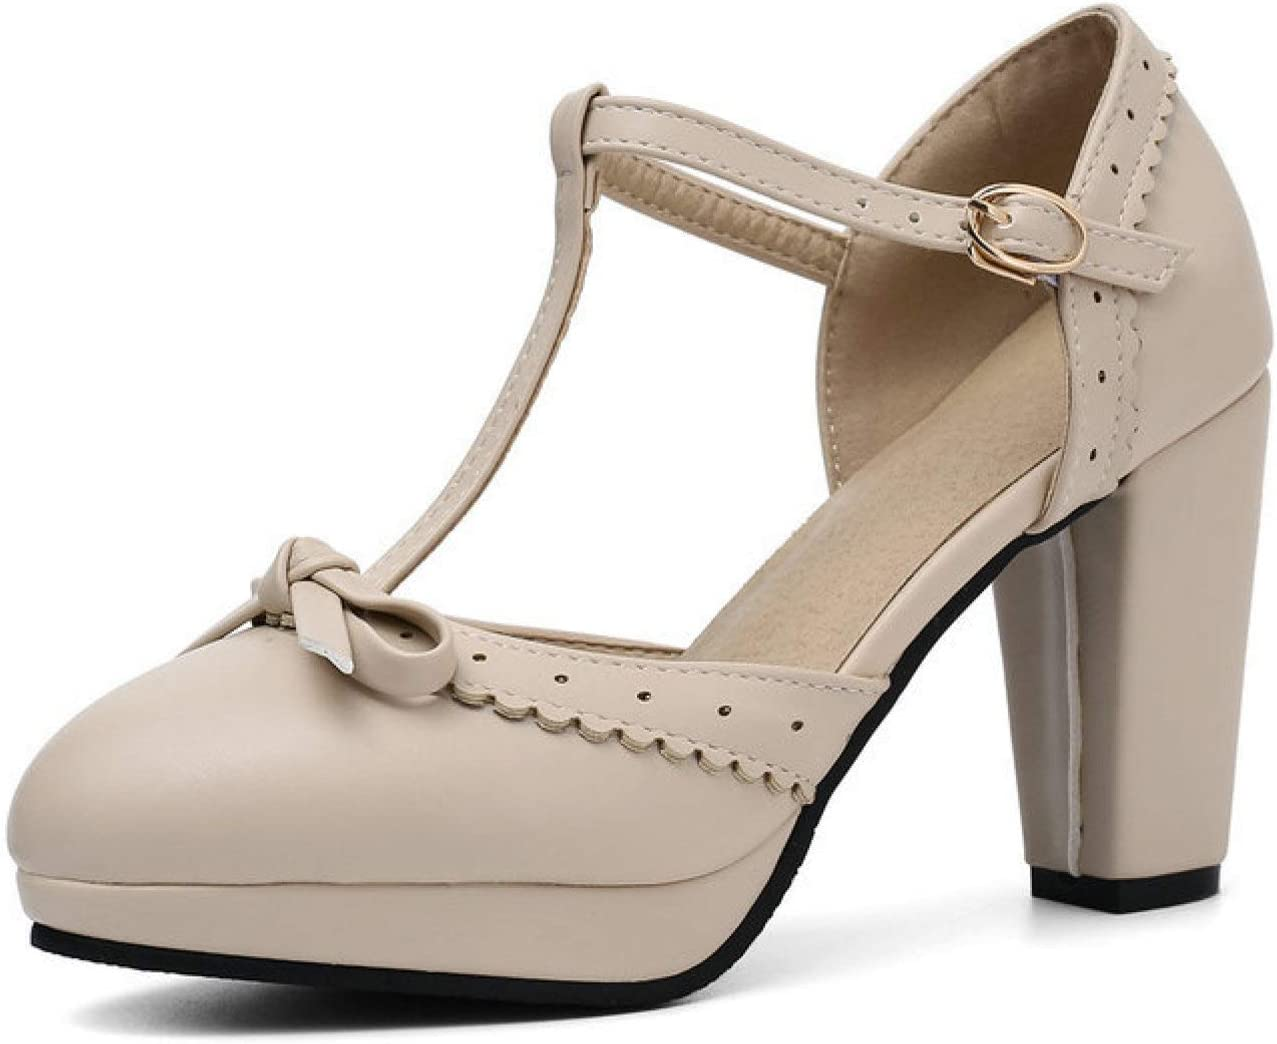 FMTZZY High Heels for Women Women's Genuine Virginia Beach Mall Free Shipping Mary Heel Chunky P Jane